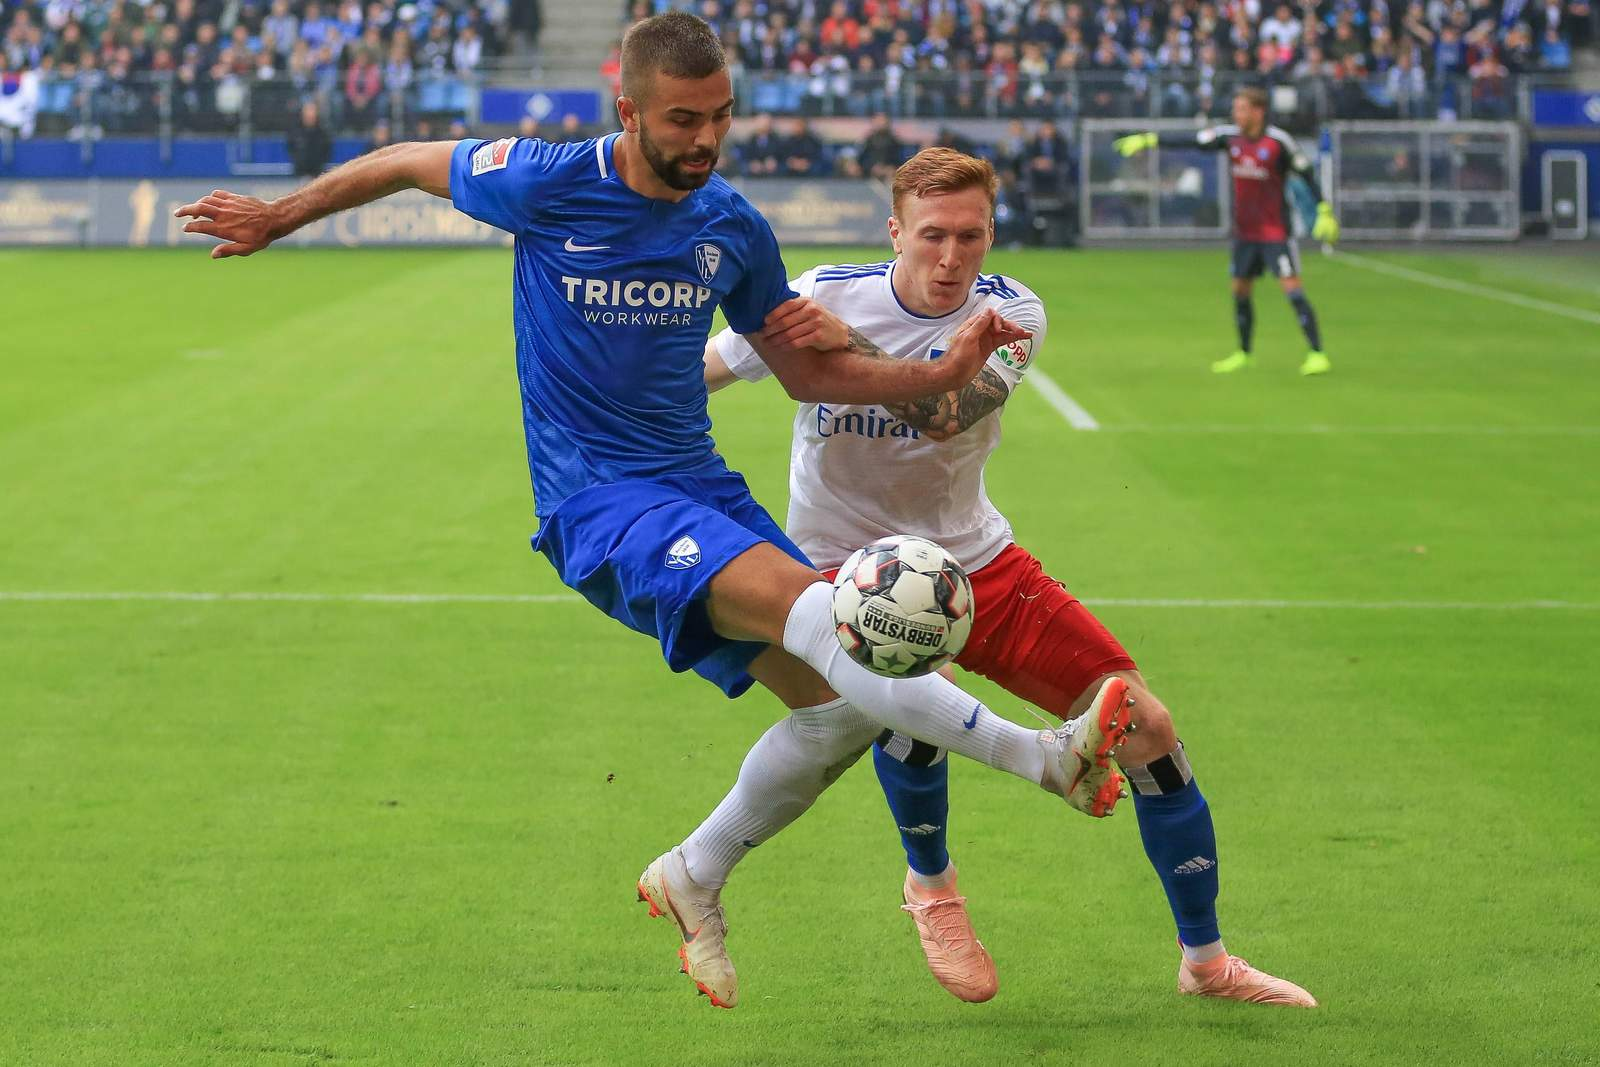 Lukas Hinterseer am Ball für den VfL Bochum